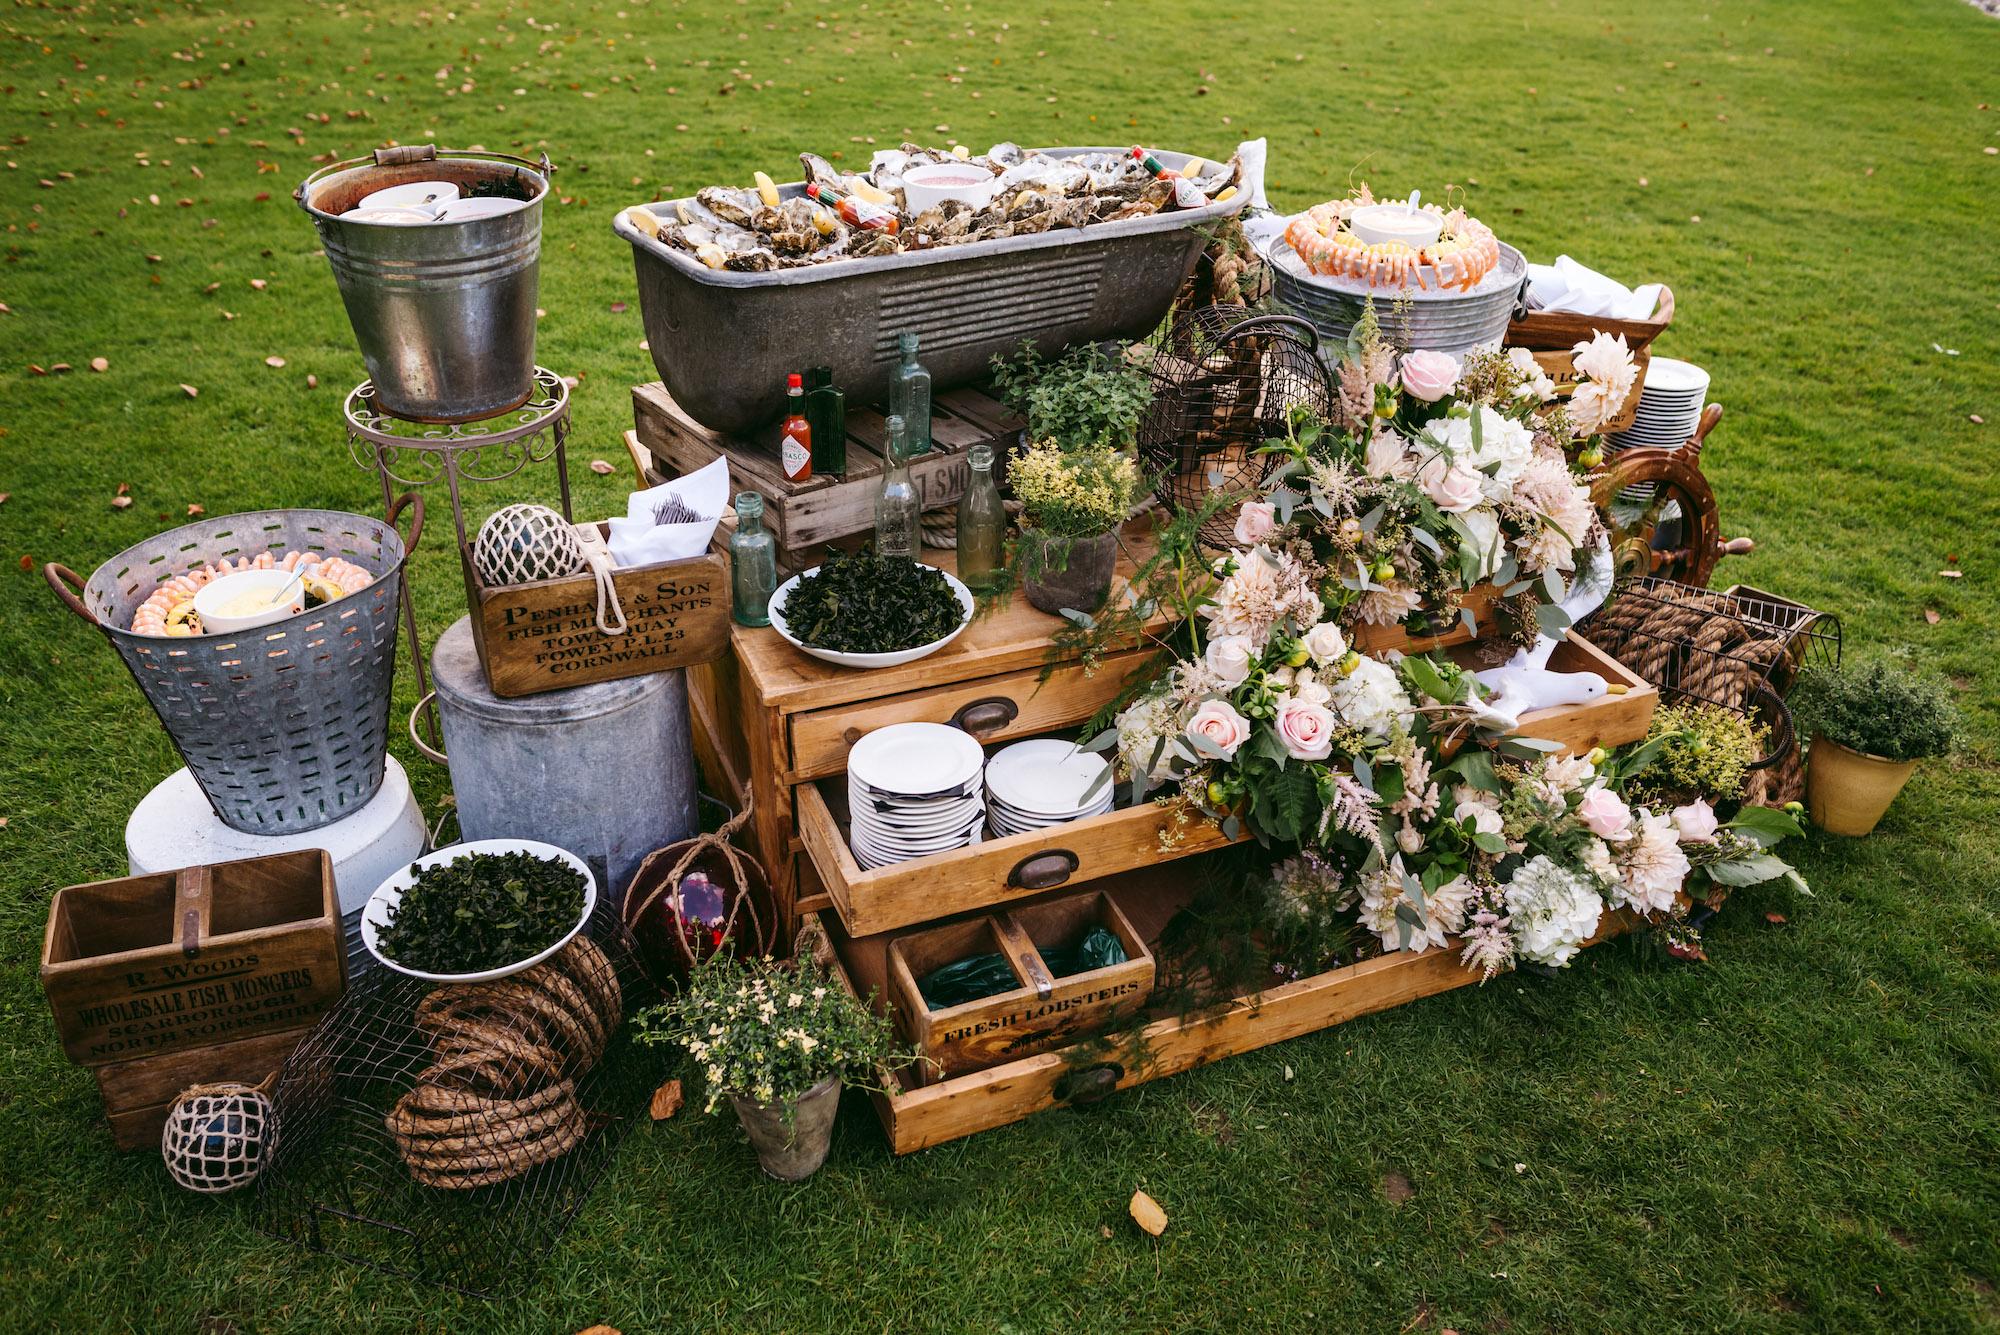 55   Hengrave Hall Wedding   Suffolk Wedding   Lamare London   Luxury Wedding Planner   Jon Mold Photography.jpg